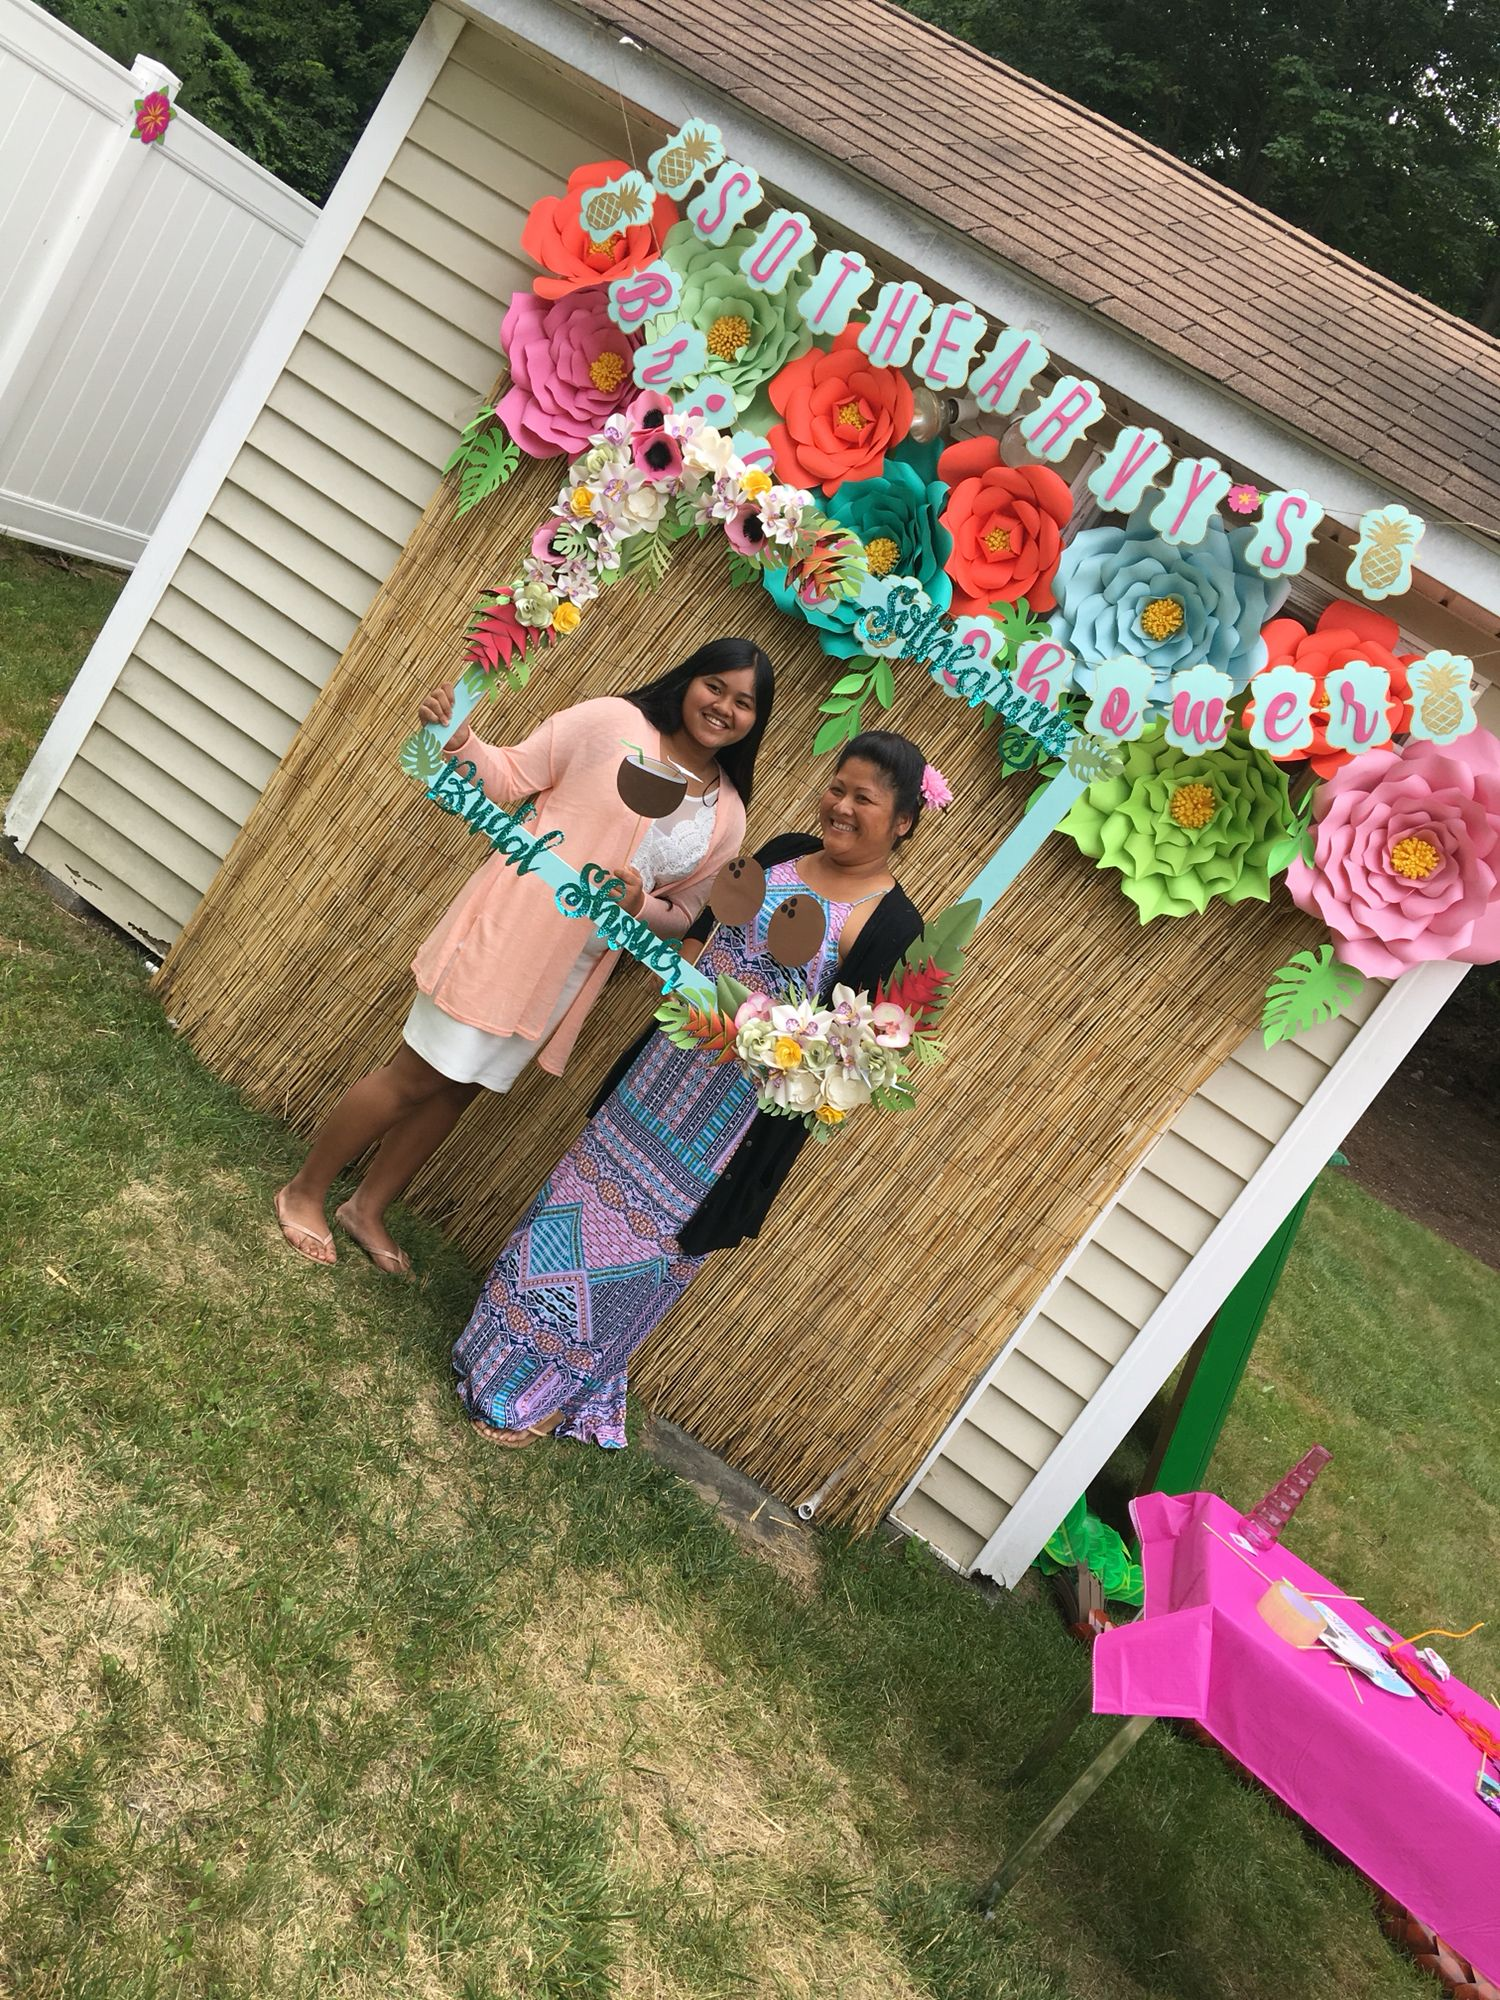 luau backdrop summer party plans pinterest party planning